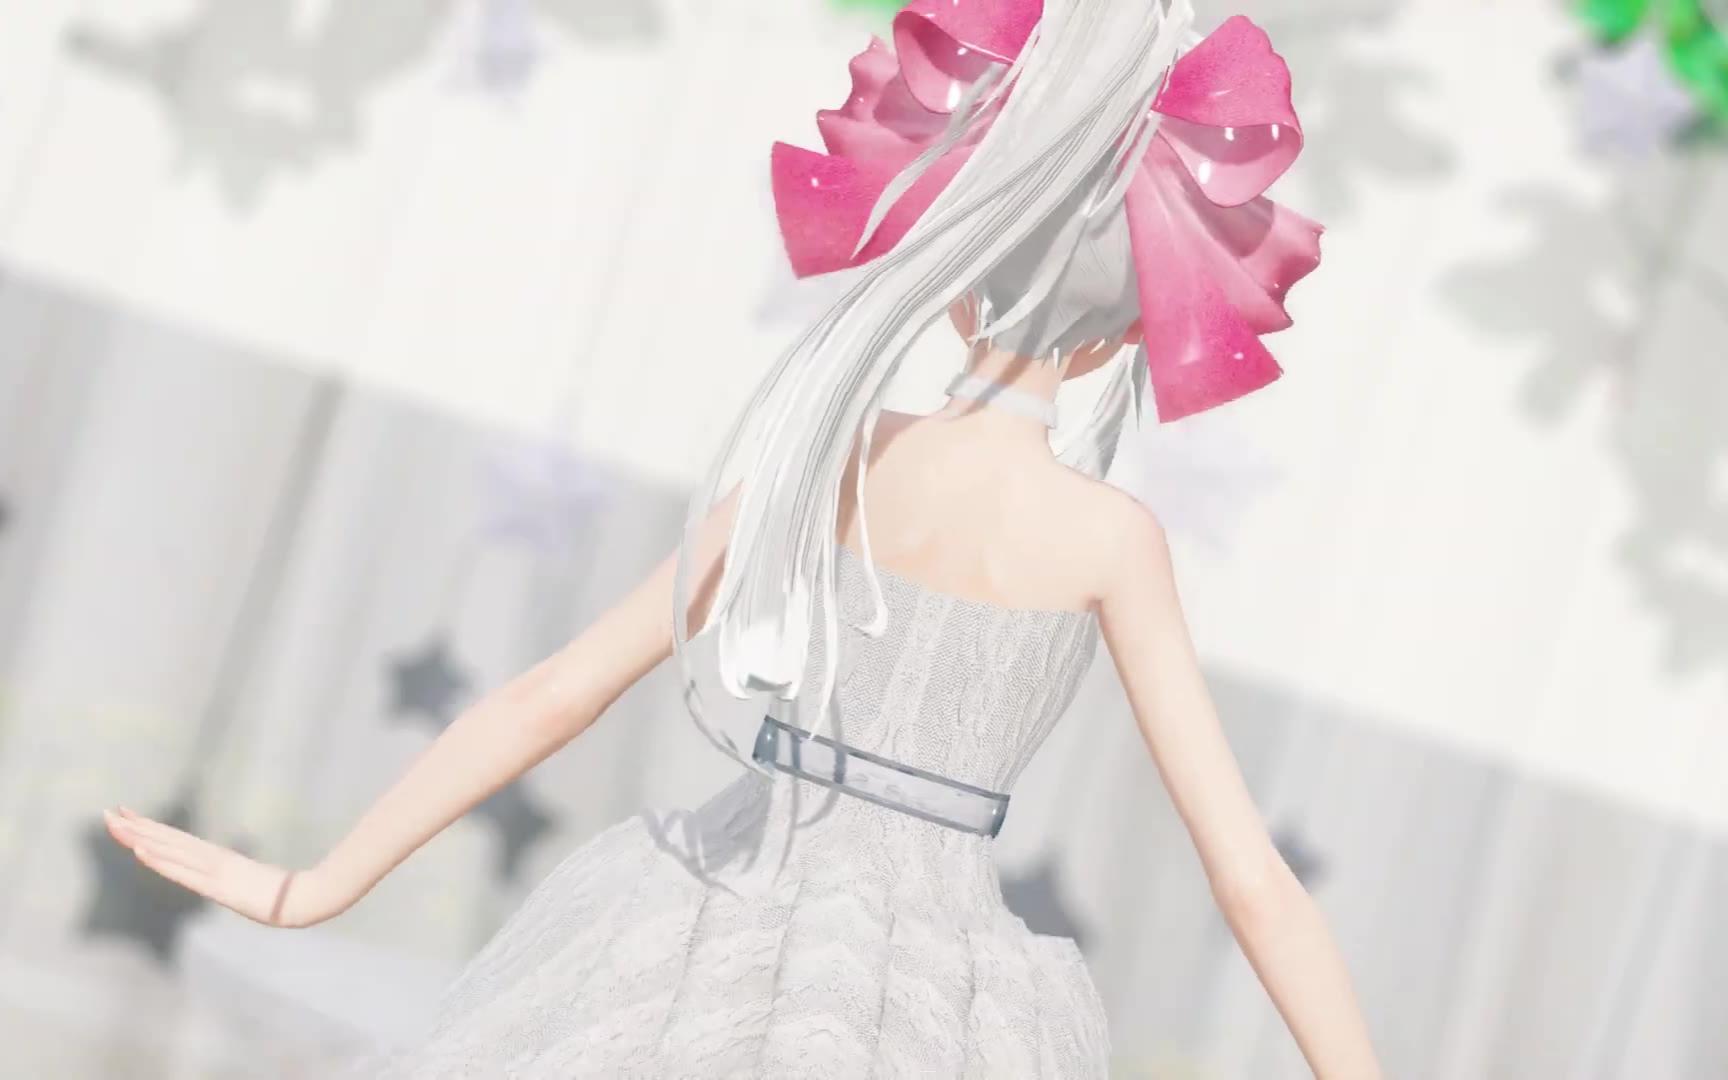 [MMD]弱音HAKU - Darling Dance